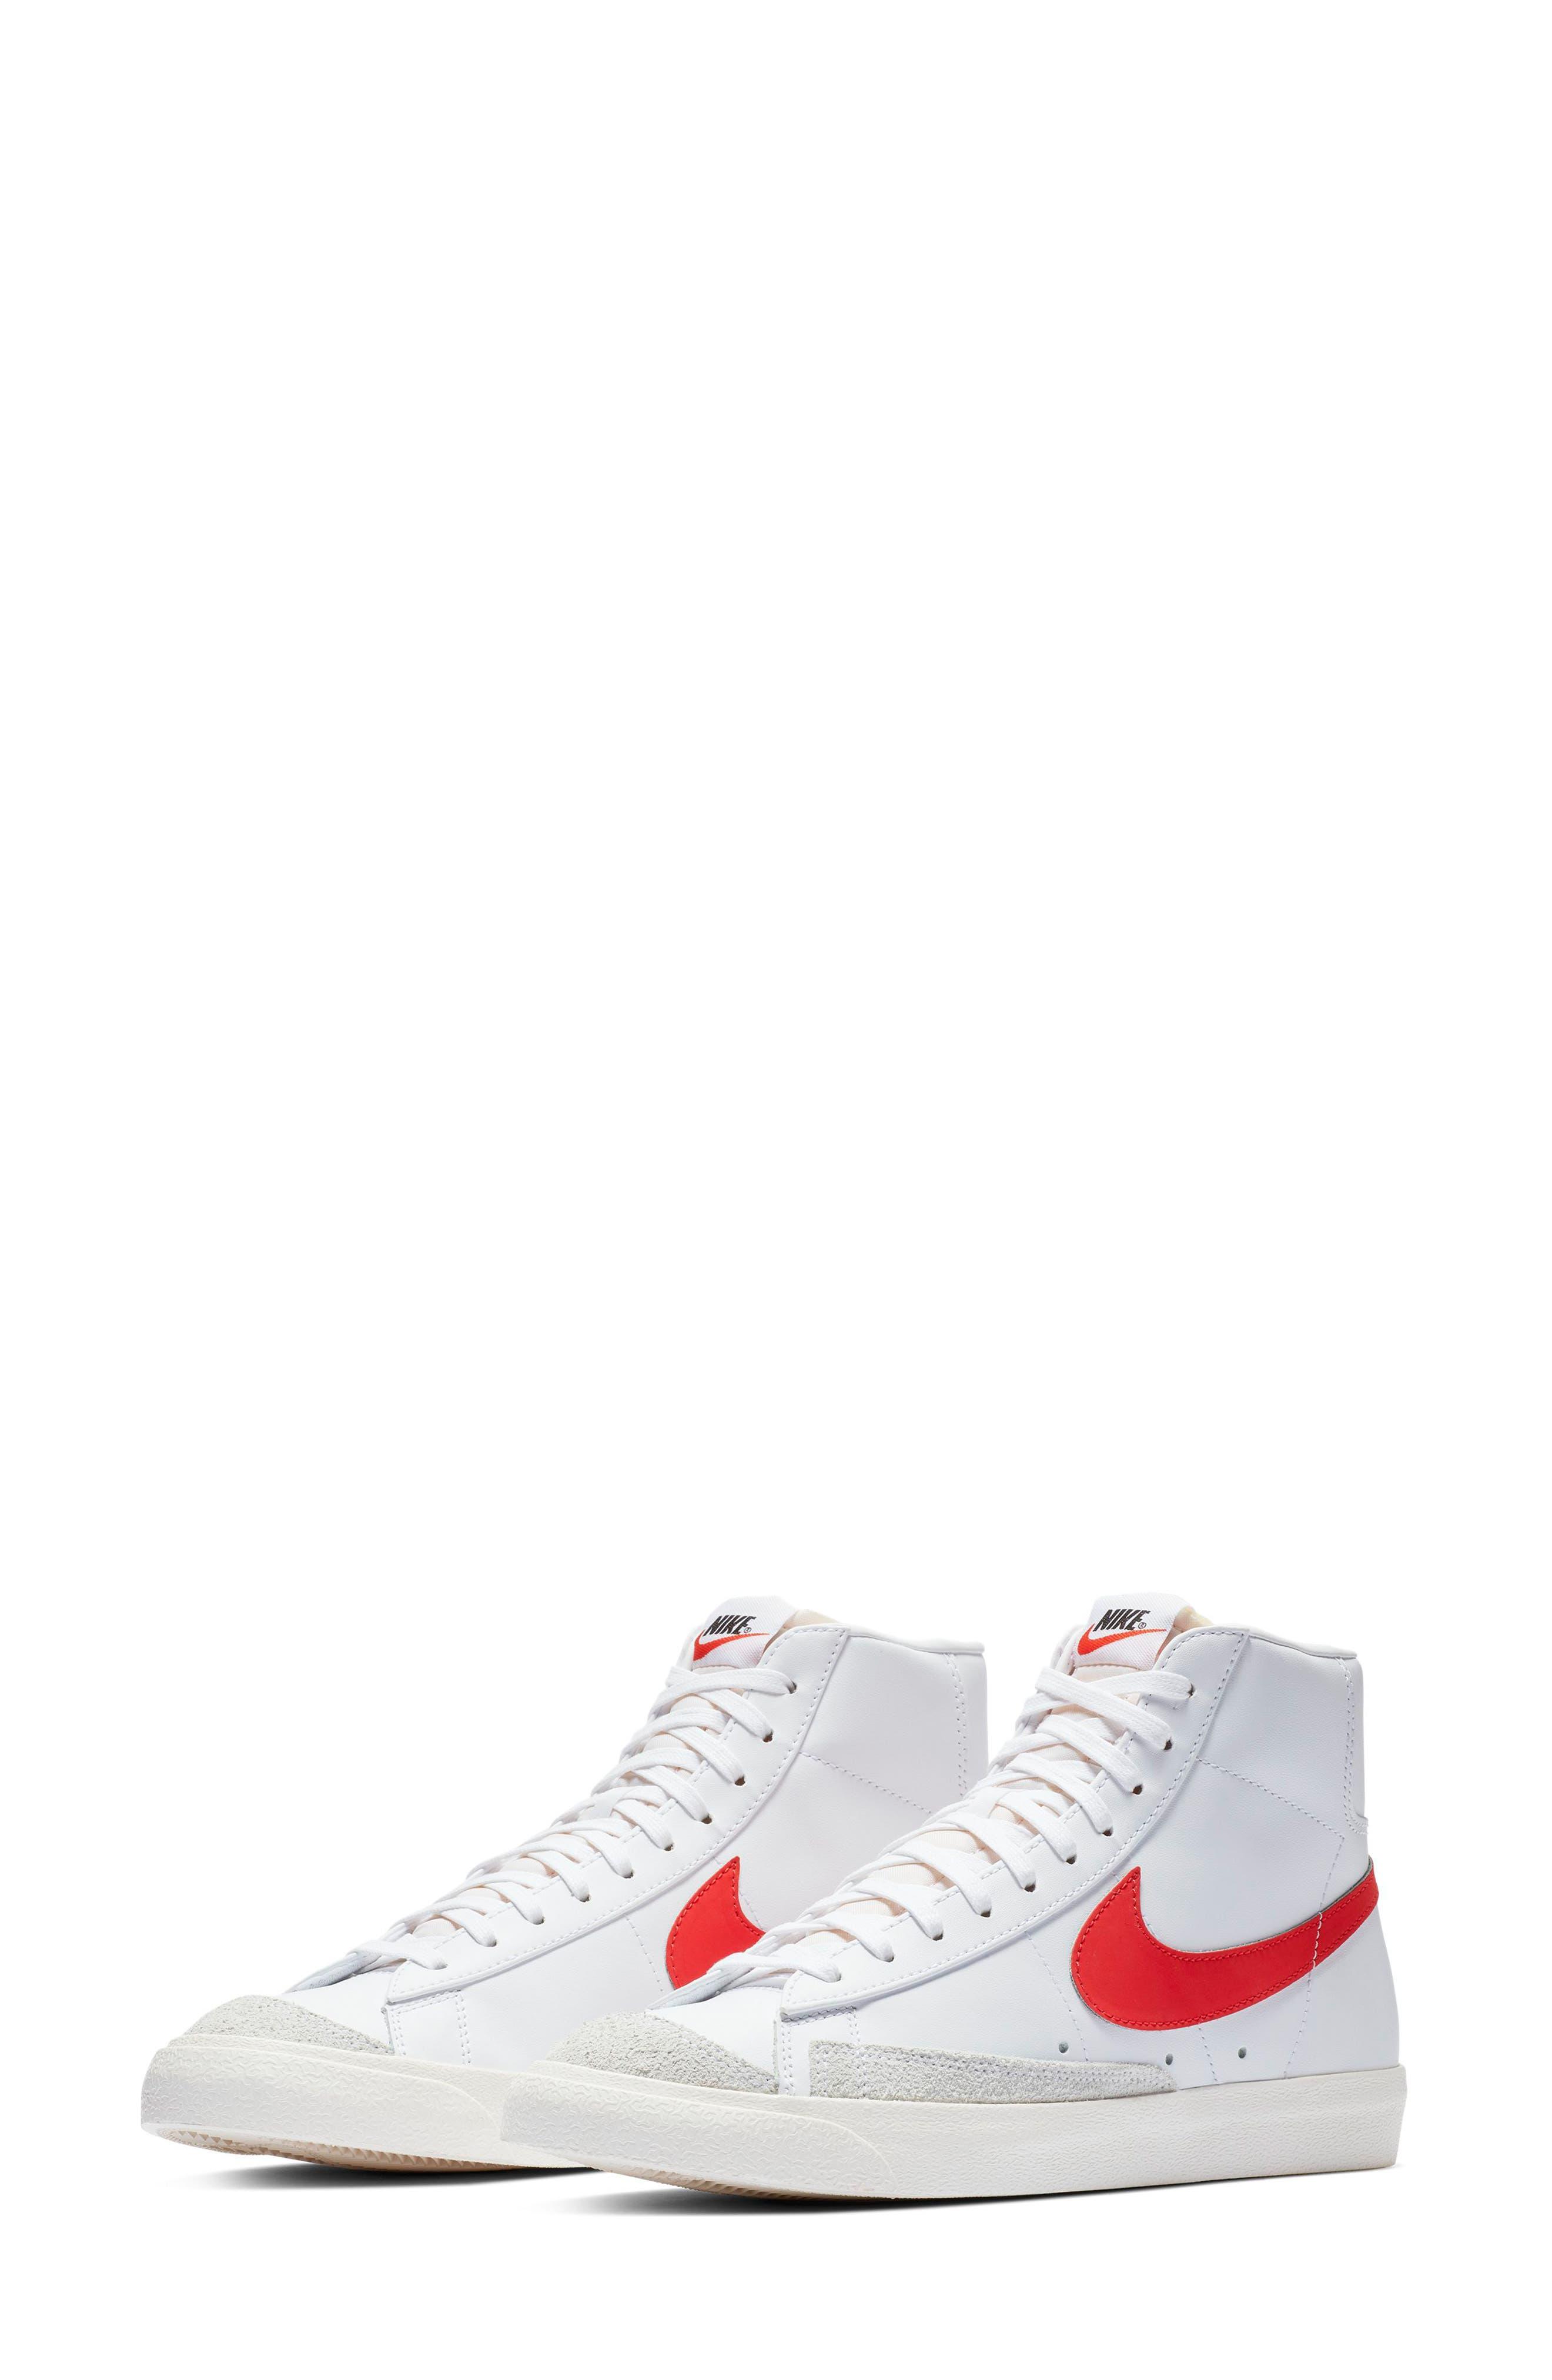 Blazer Mid '77 Vintage Sneaker, Main, color, HABANERO RED/ SAIL/ WHITE